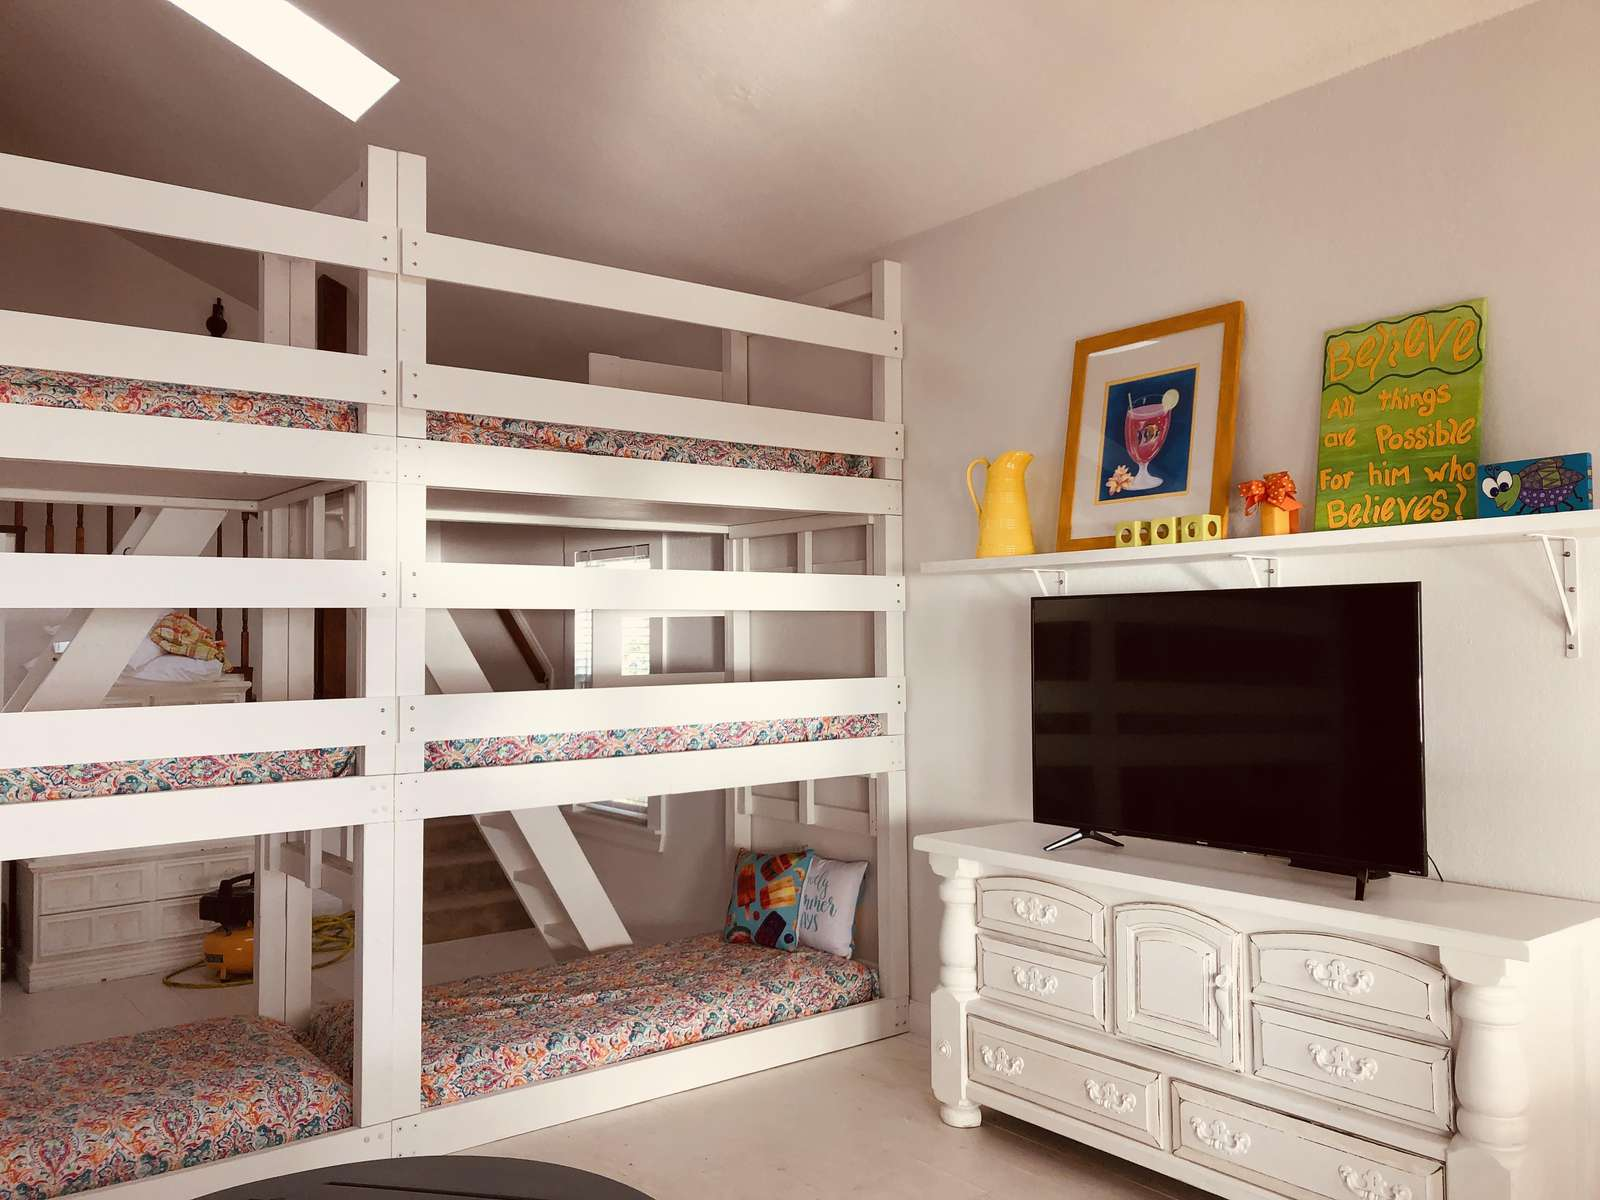 bunk room that sleeps 6 people